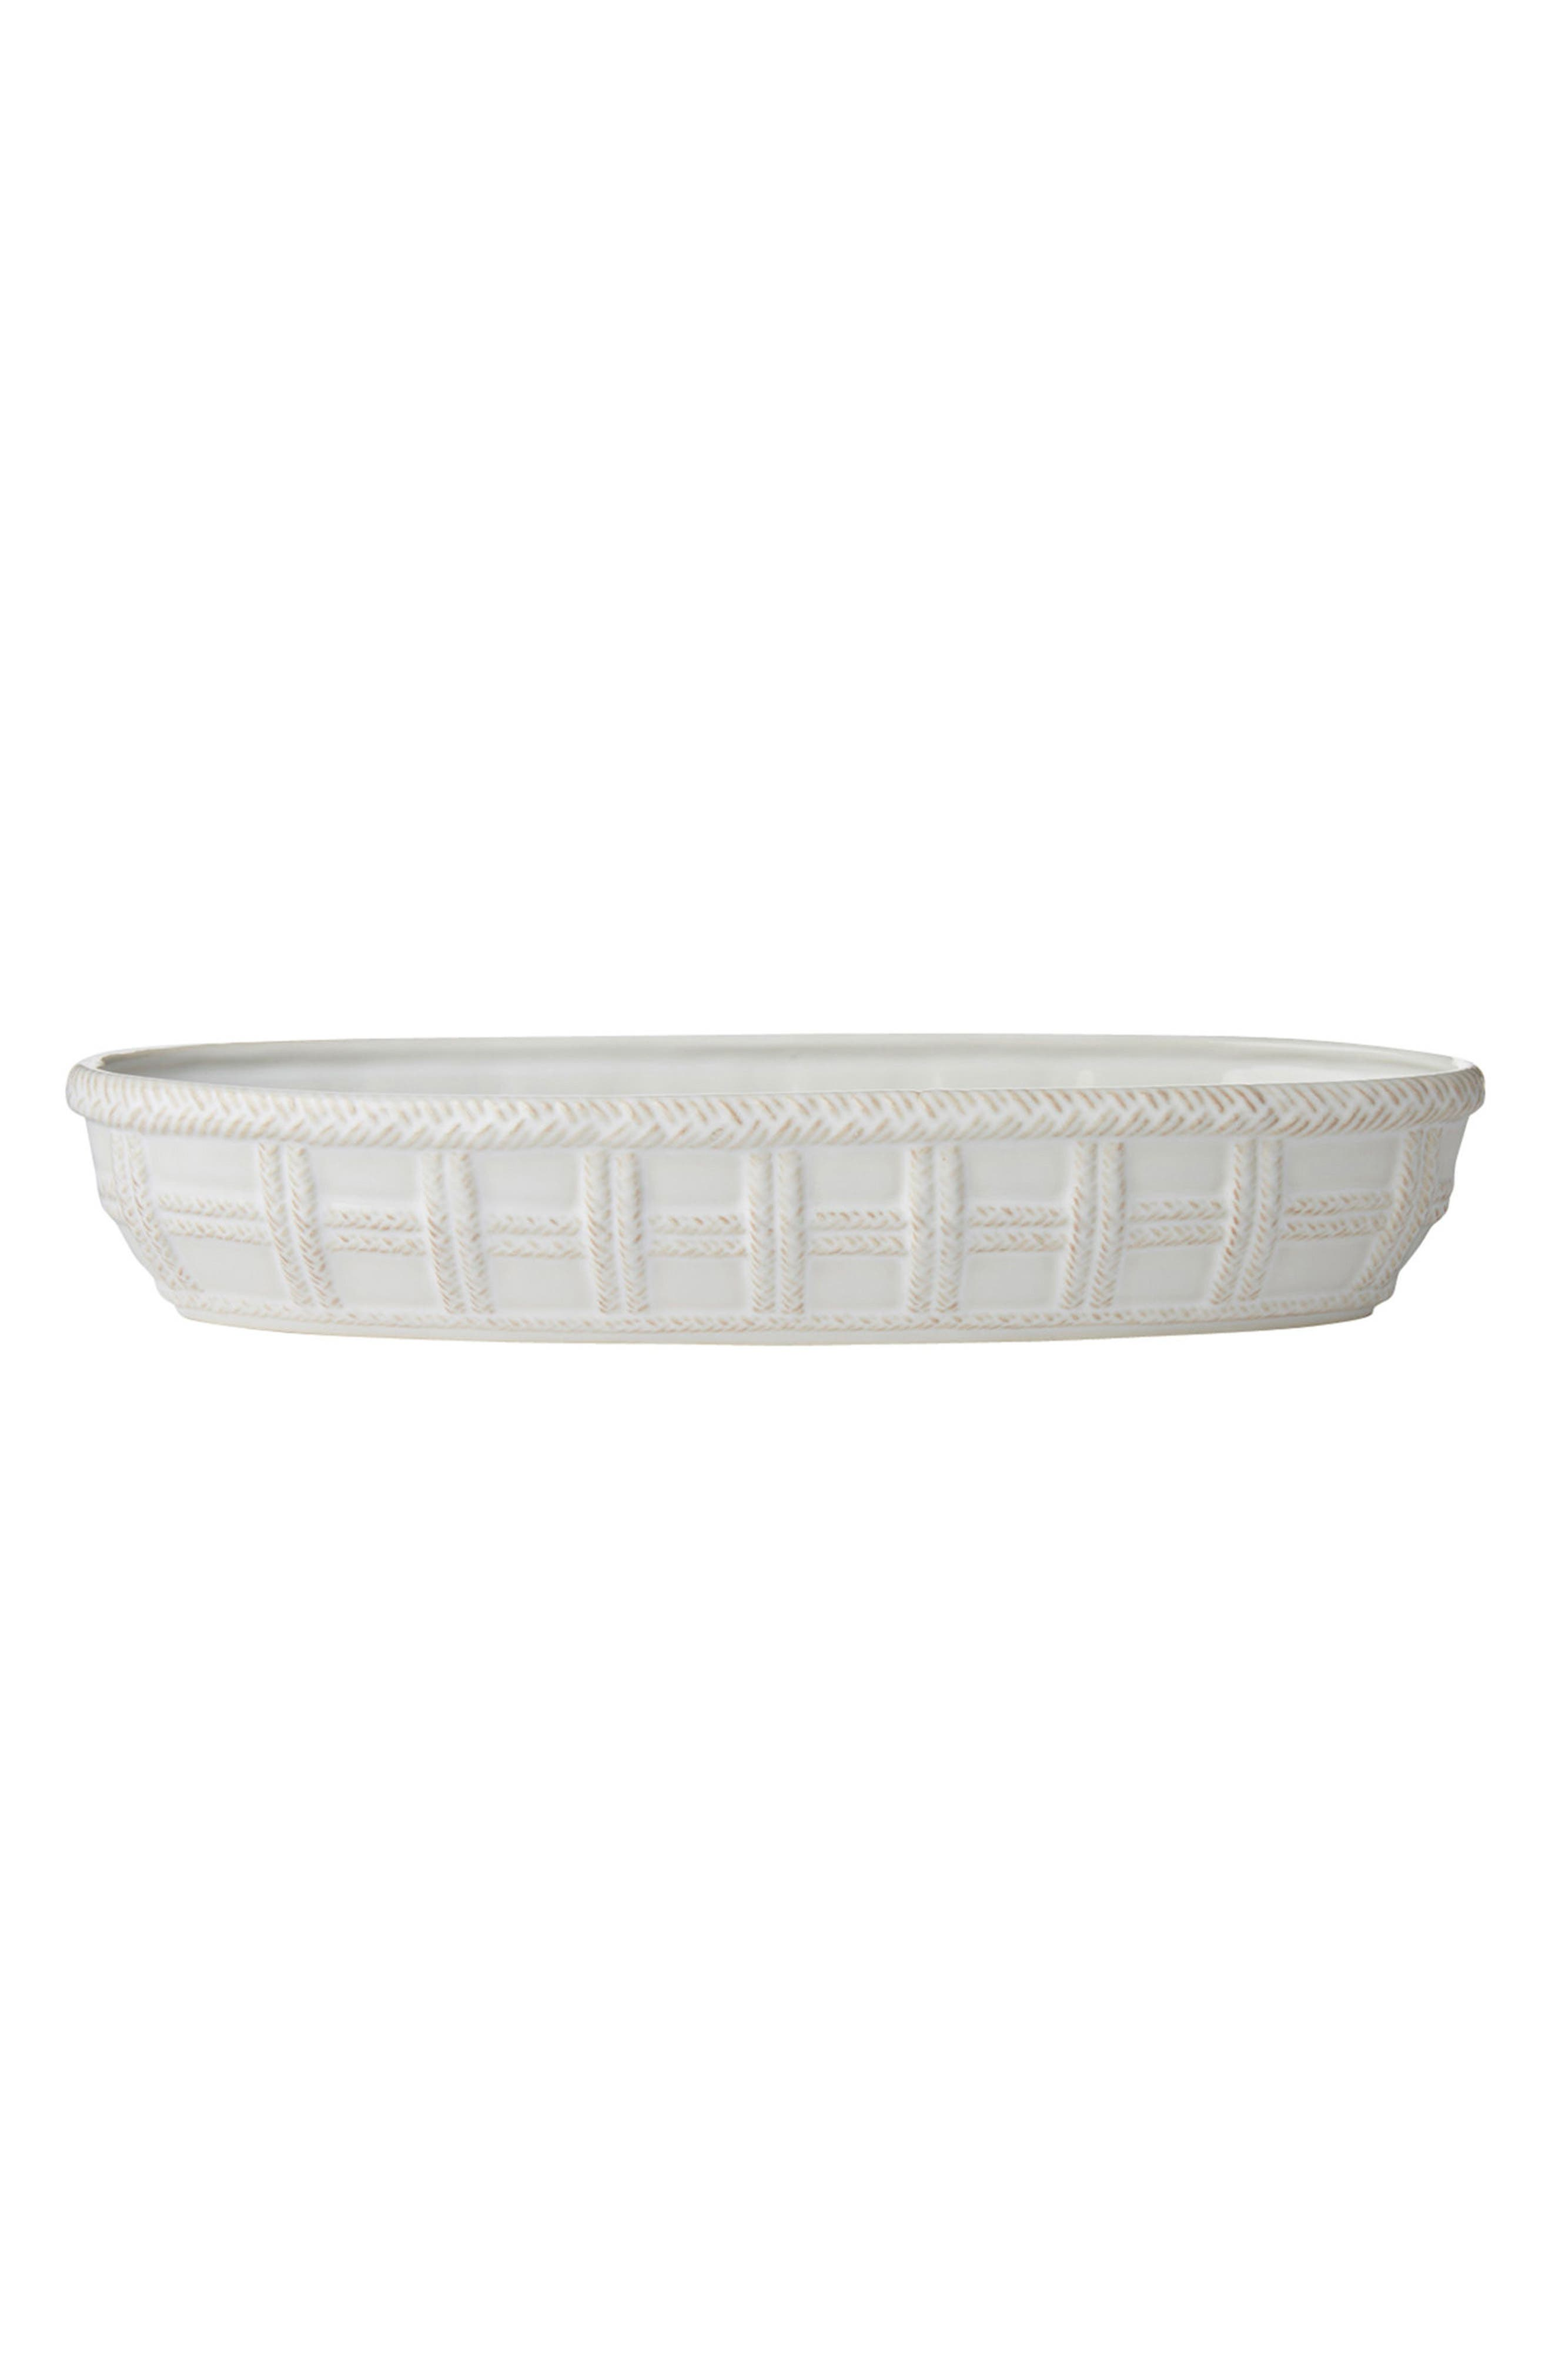 Main Image - Juliska Le Panier Ceramic Bread Basket